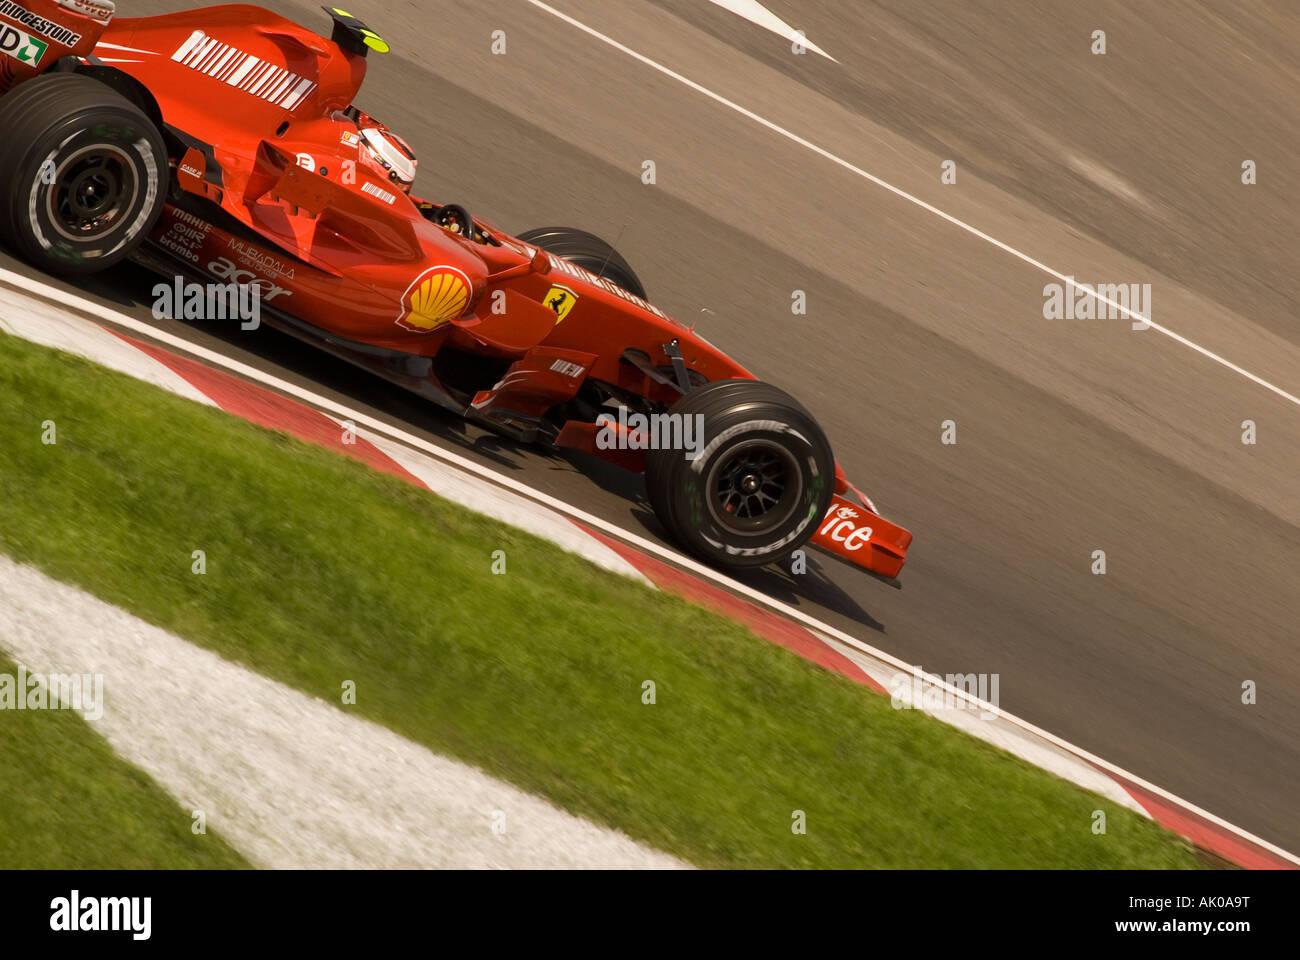 Formula 1 race car driver and World Champion Kimi Raikkonen from Finland at the Montreal 2007 Grand Prix. - Stock Image